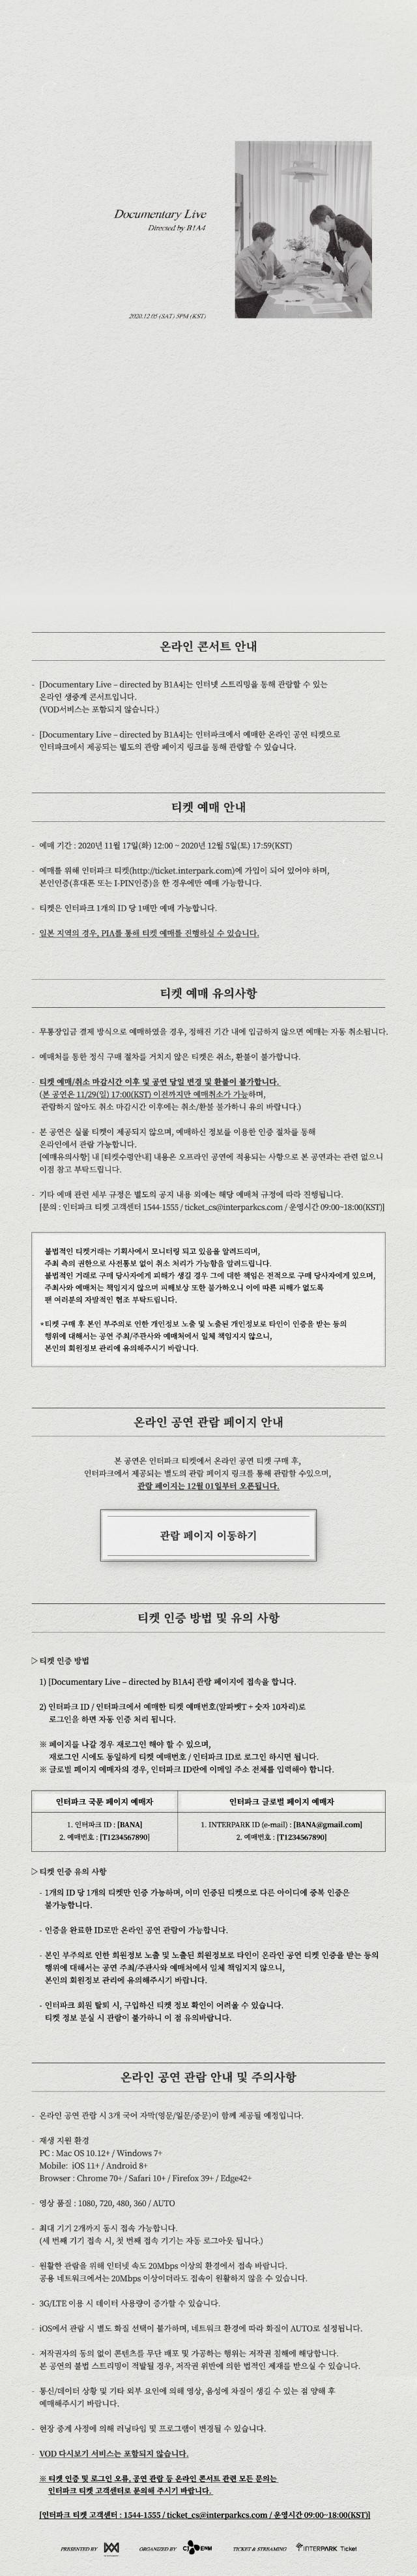 B1A4_CONCERT_TICKET_PAGE_KOR.jpg